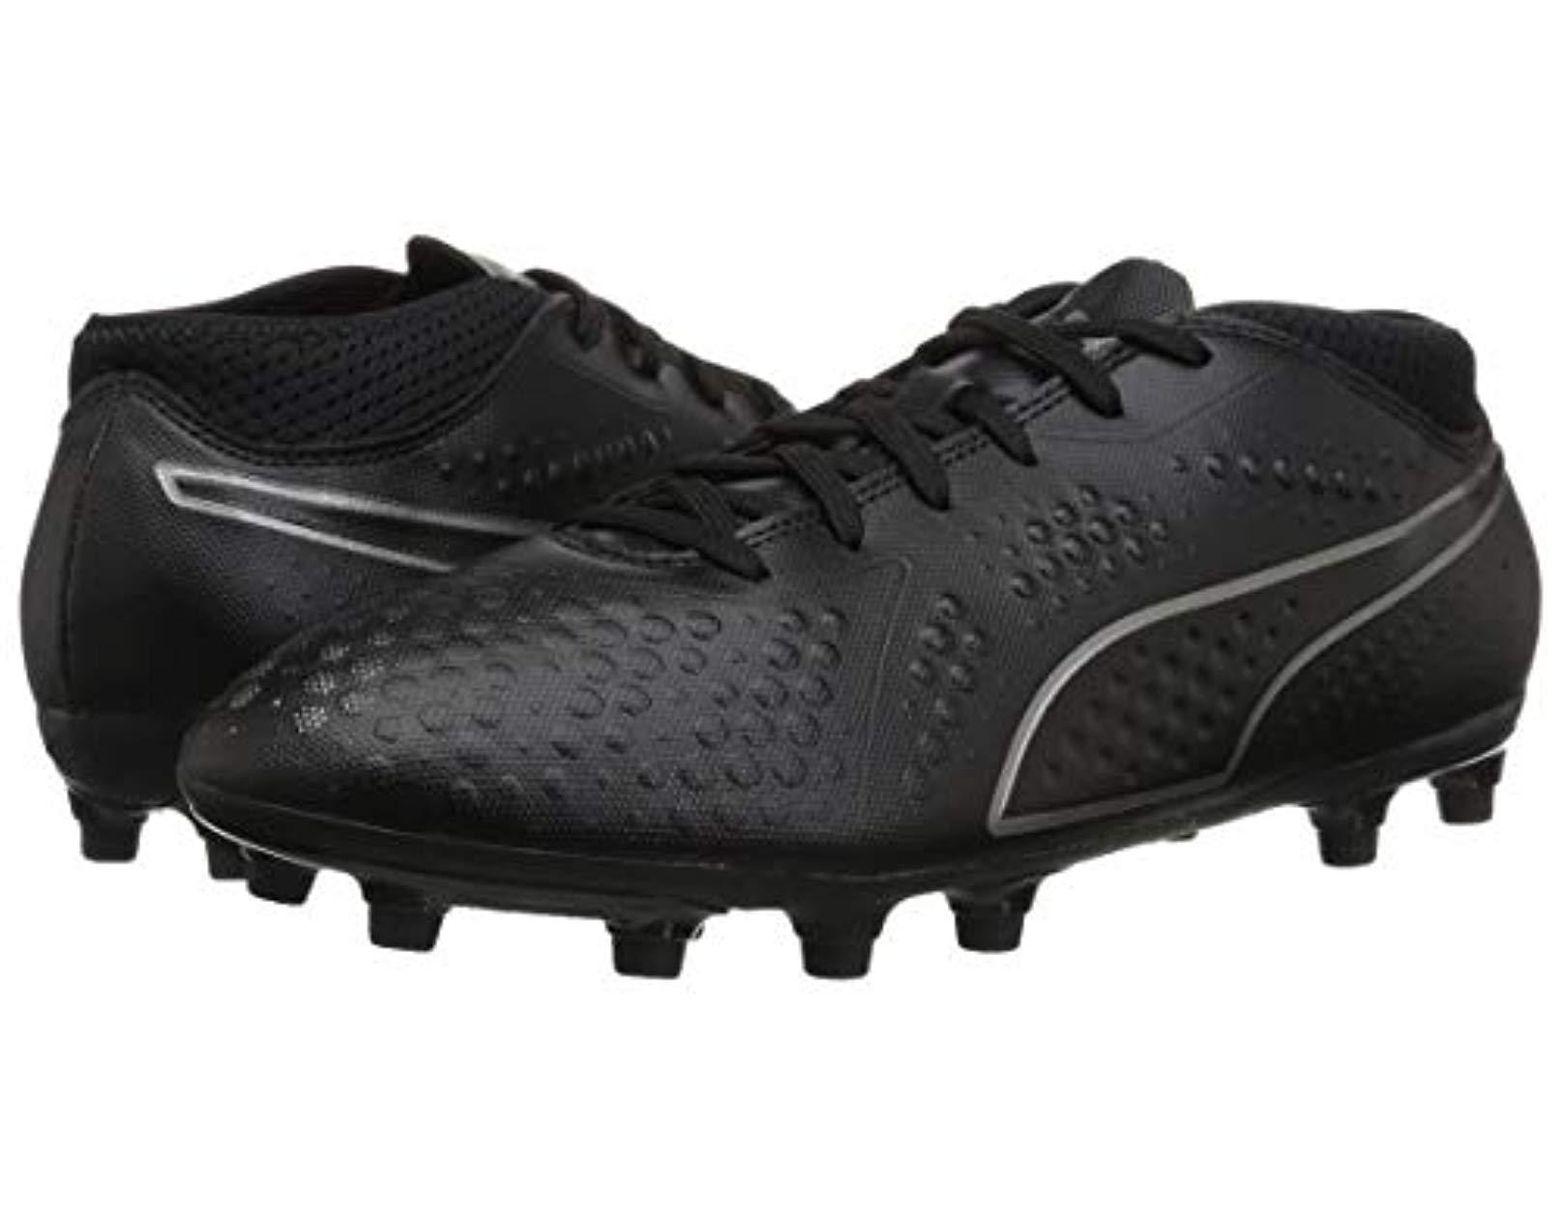 56a060d45 PUMA One 4 Syn Fg in Black for Men - Save 13% - Lyst